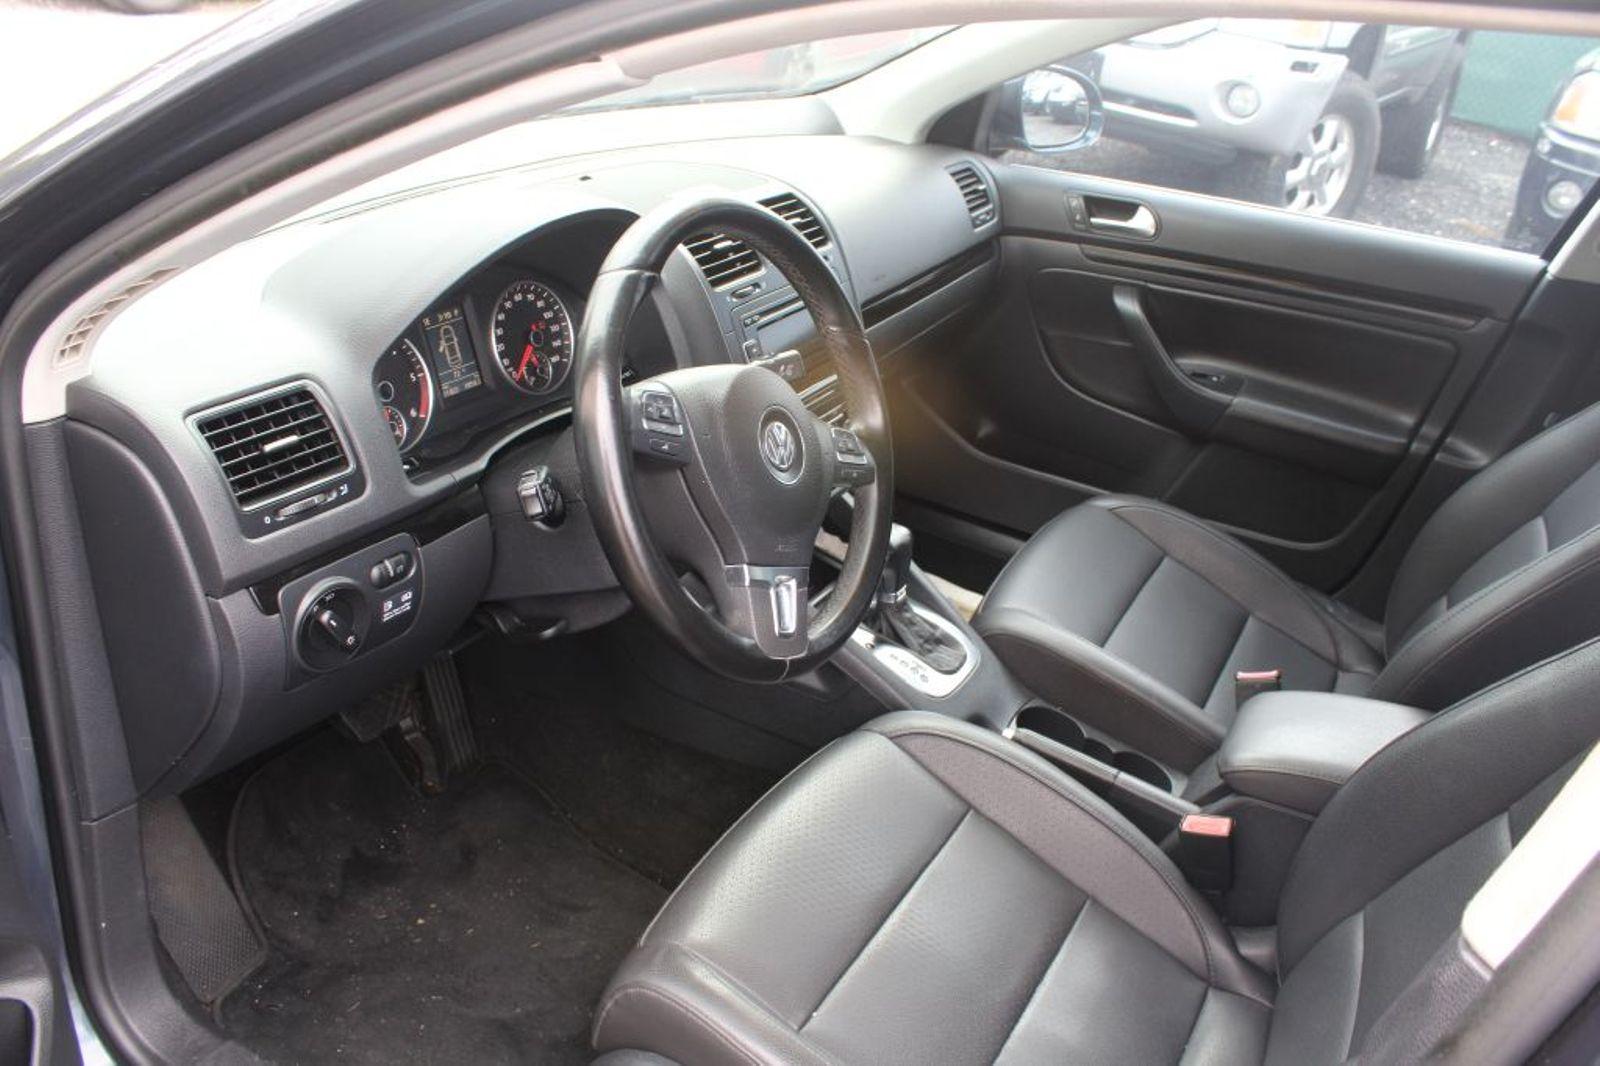 2010 Volkswagen Jetta Tdi City Md South County Public Auto Auction Sedan In Harwood